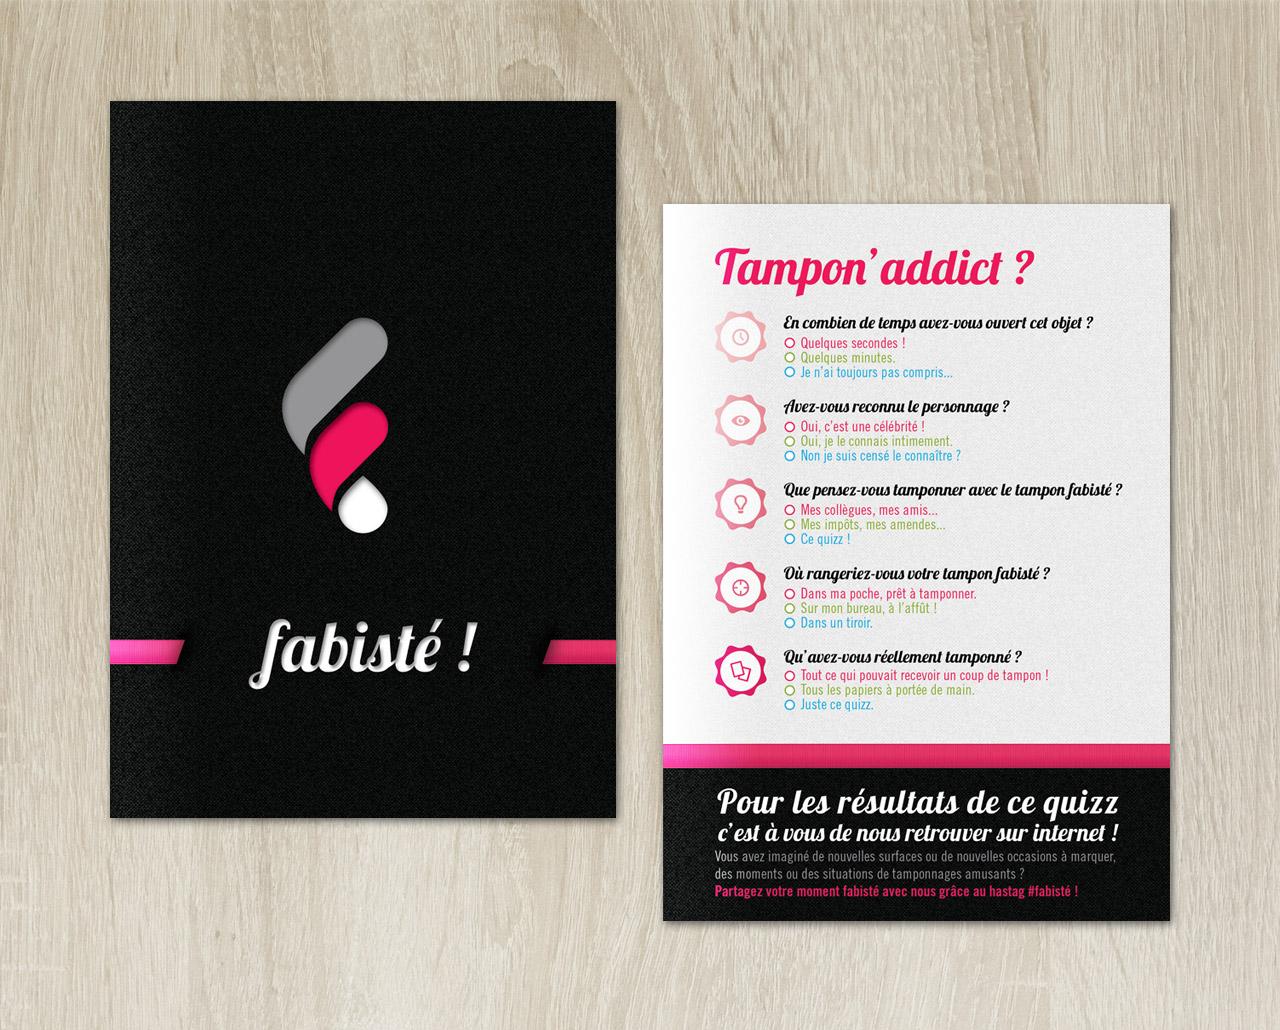 fabisto-flyer-creation-communication-caconcept-alexis-cretin-graphiste